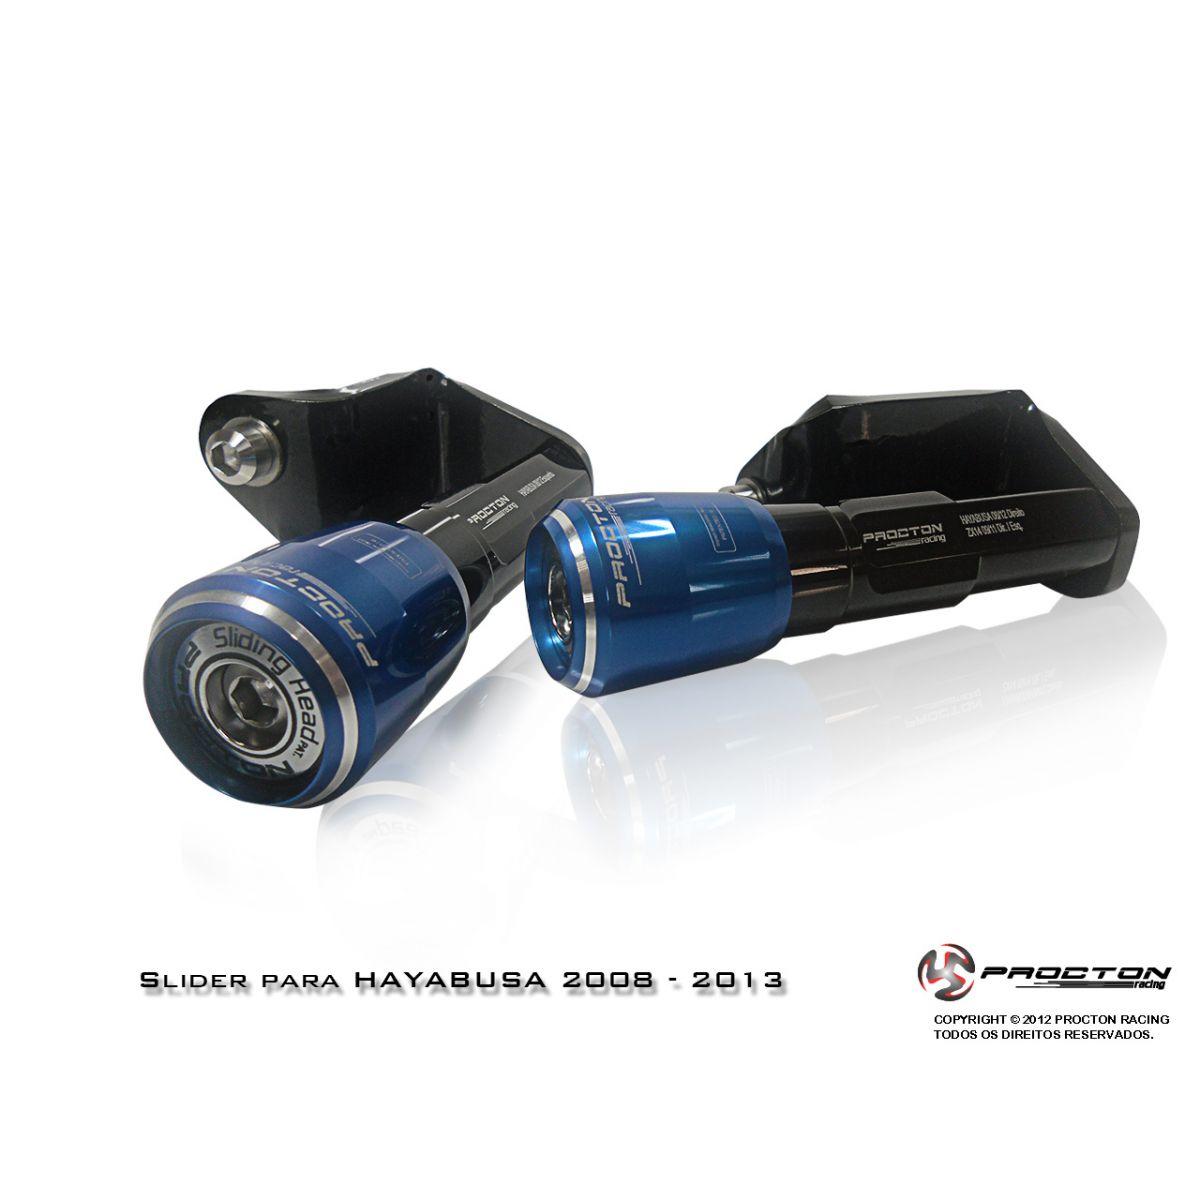 Slider Procton com Amortecimento Suzuki Hayabusa - 08/16